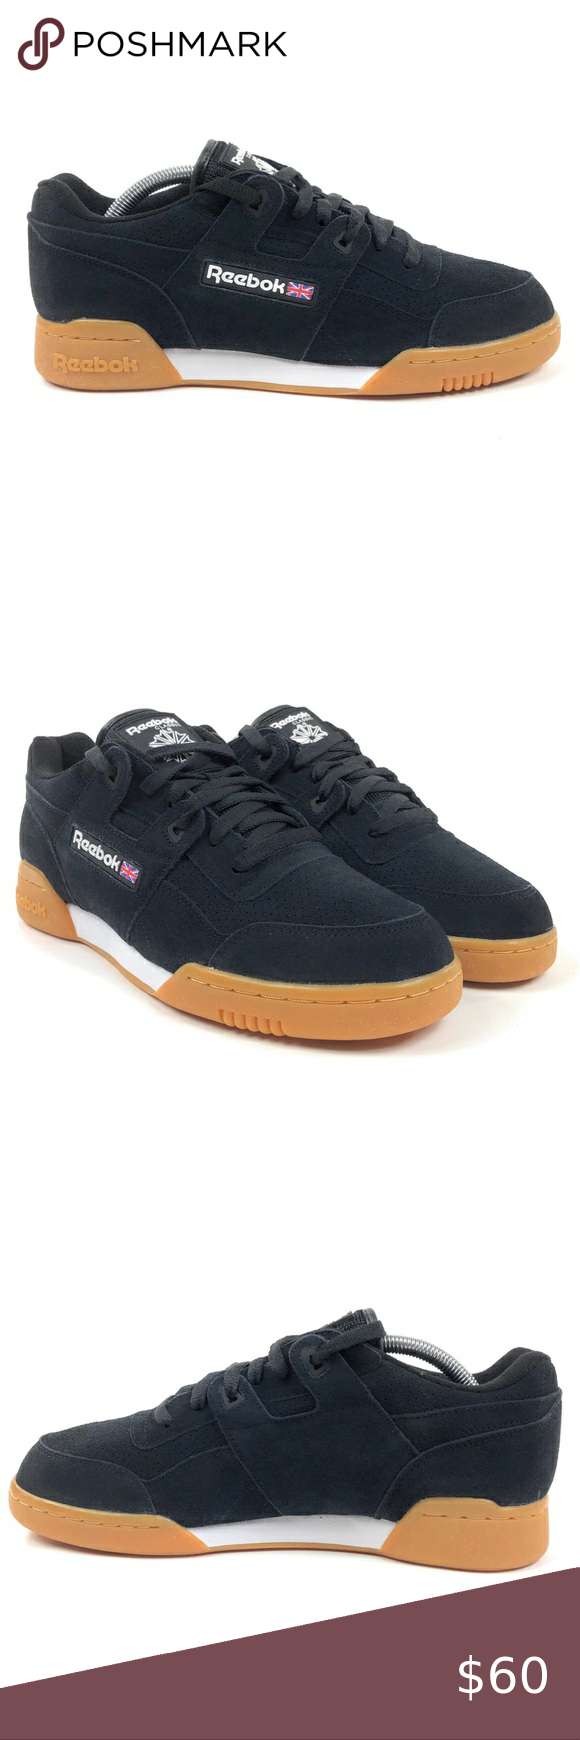 Reebok WORKOUT PLUS EG Unisex Training Shoes in Black